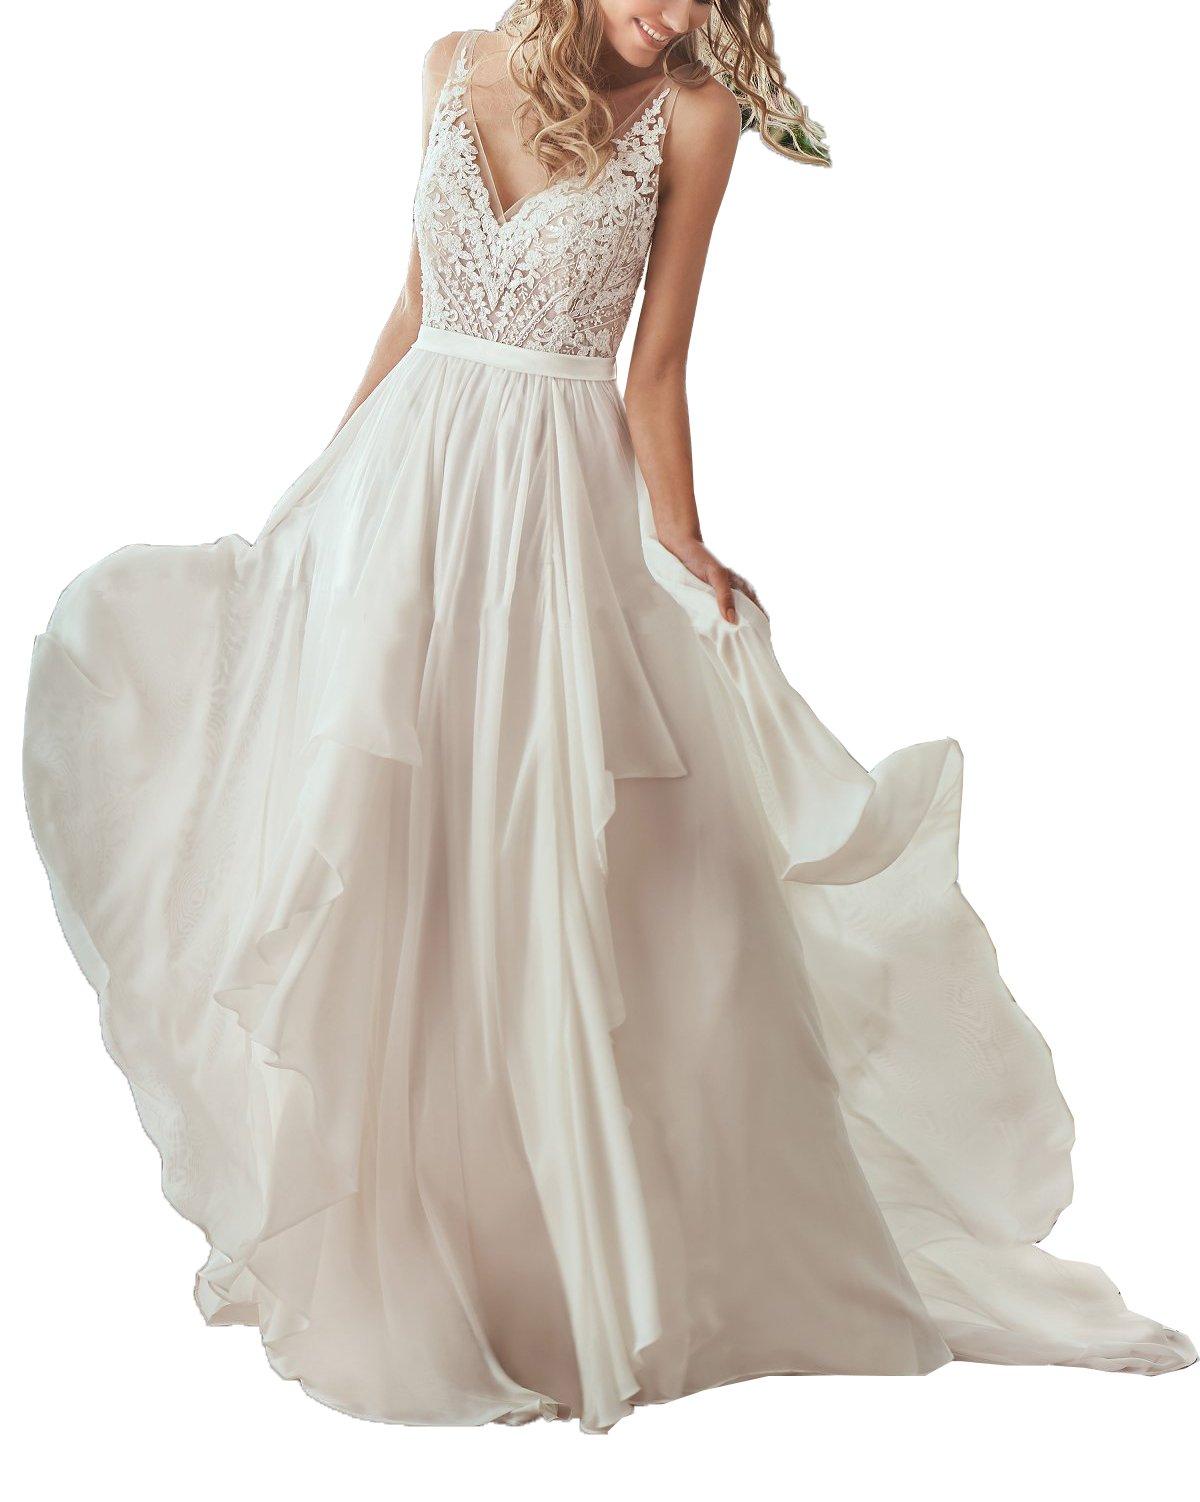 Nicefashion Women's Vintage V Back Sweep Train Bohemian Chiffon Beach Wedding Formal Gowns White US8 by Nicefashion